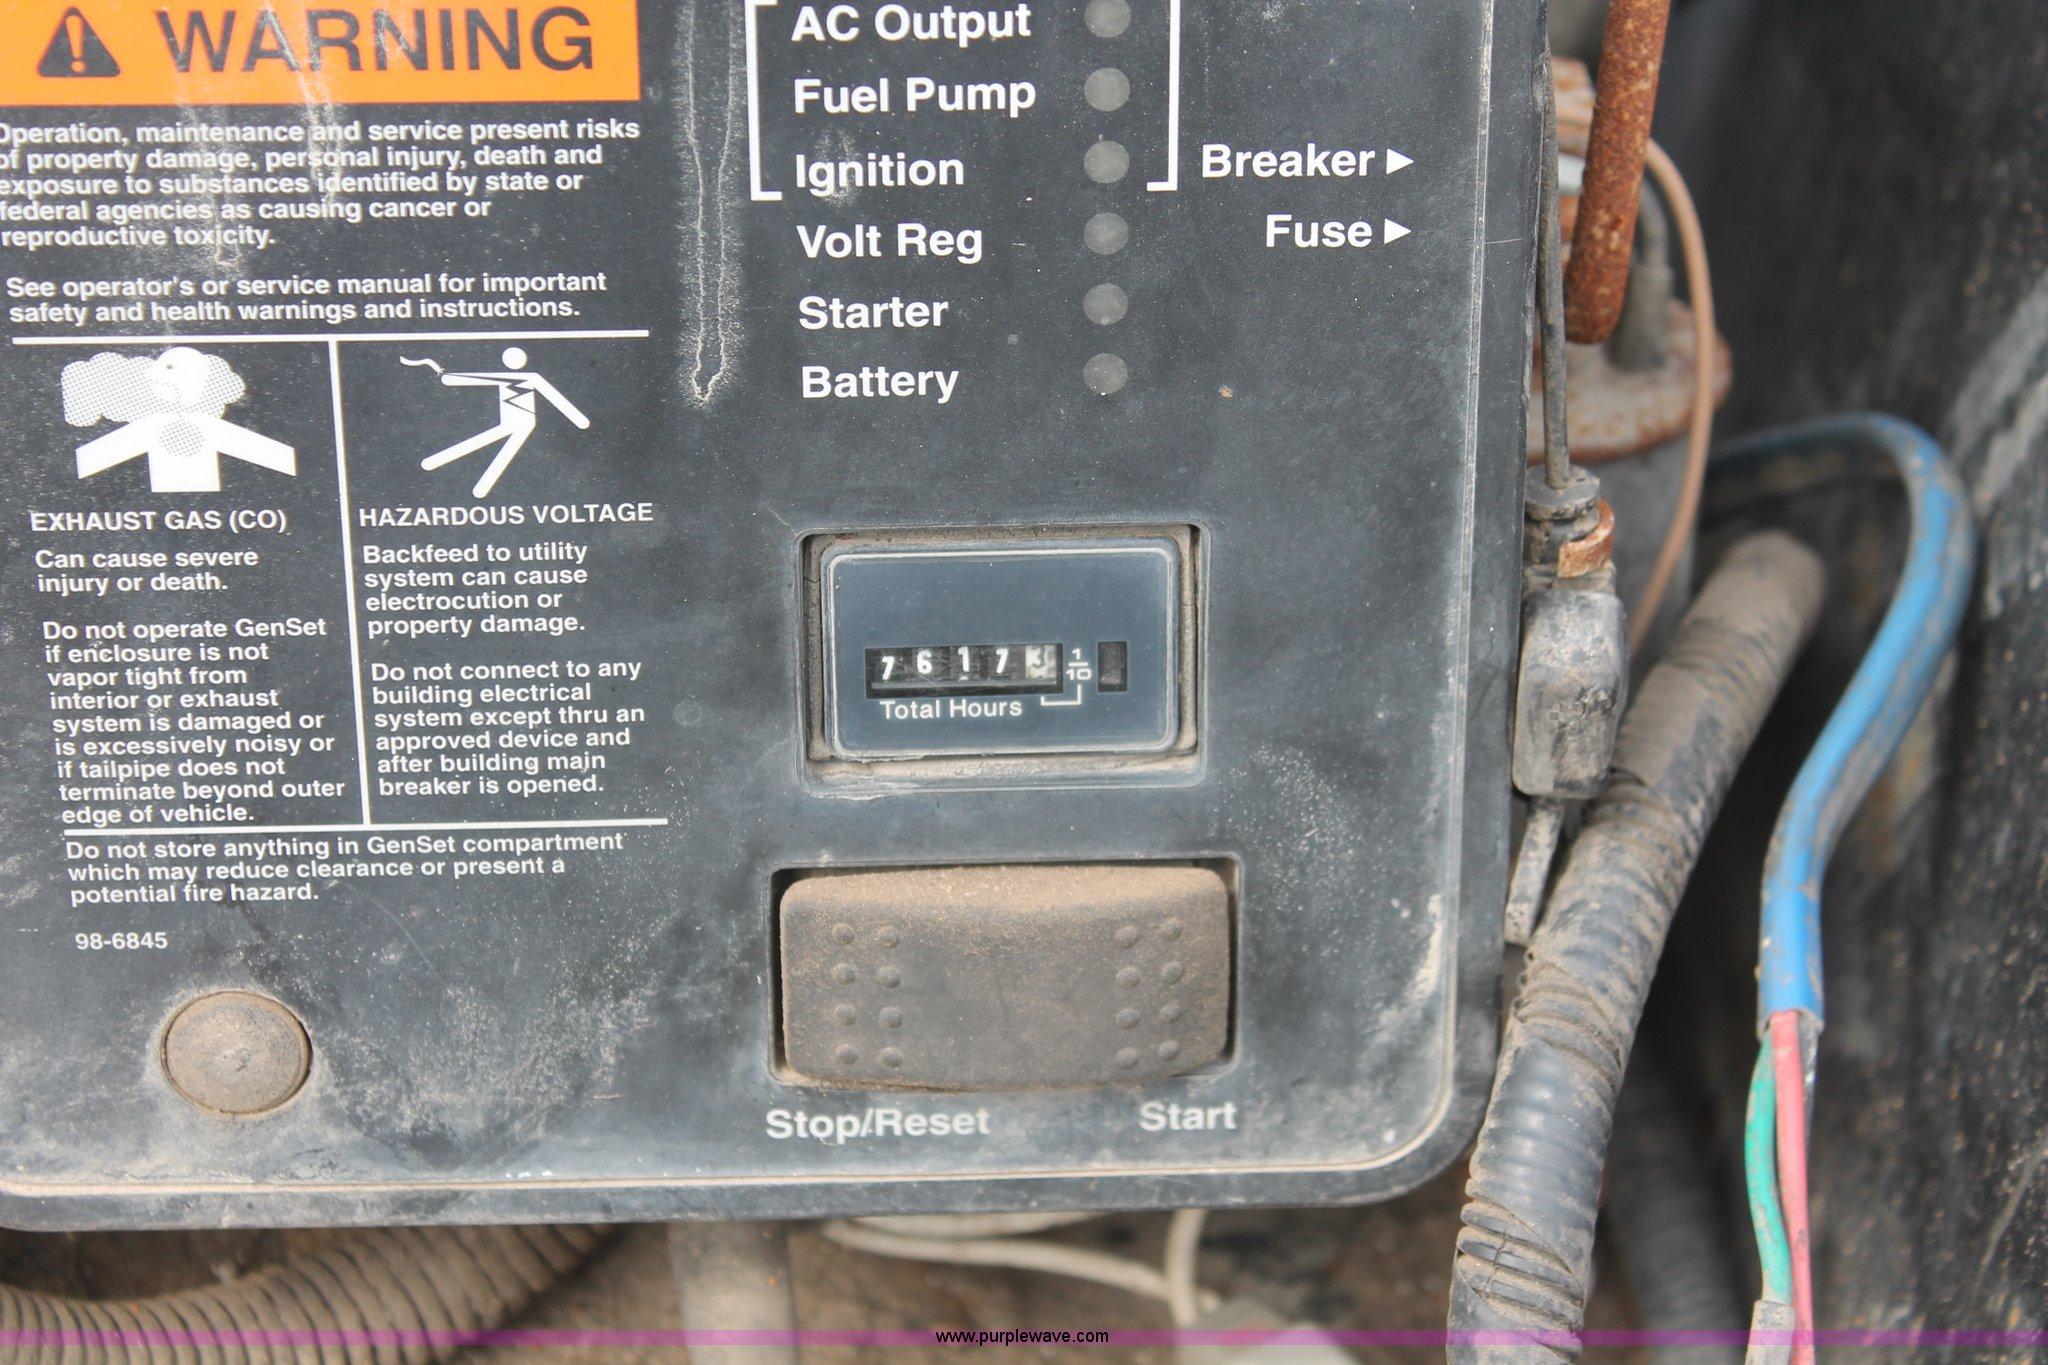 D8269G onan commercial 6500 generator item d8269 sold! june 5 c onan 6500 commercial generator wiring diagram at panicattacktreatment.co